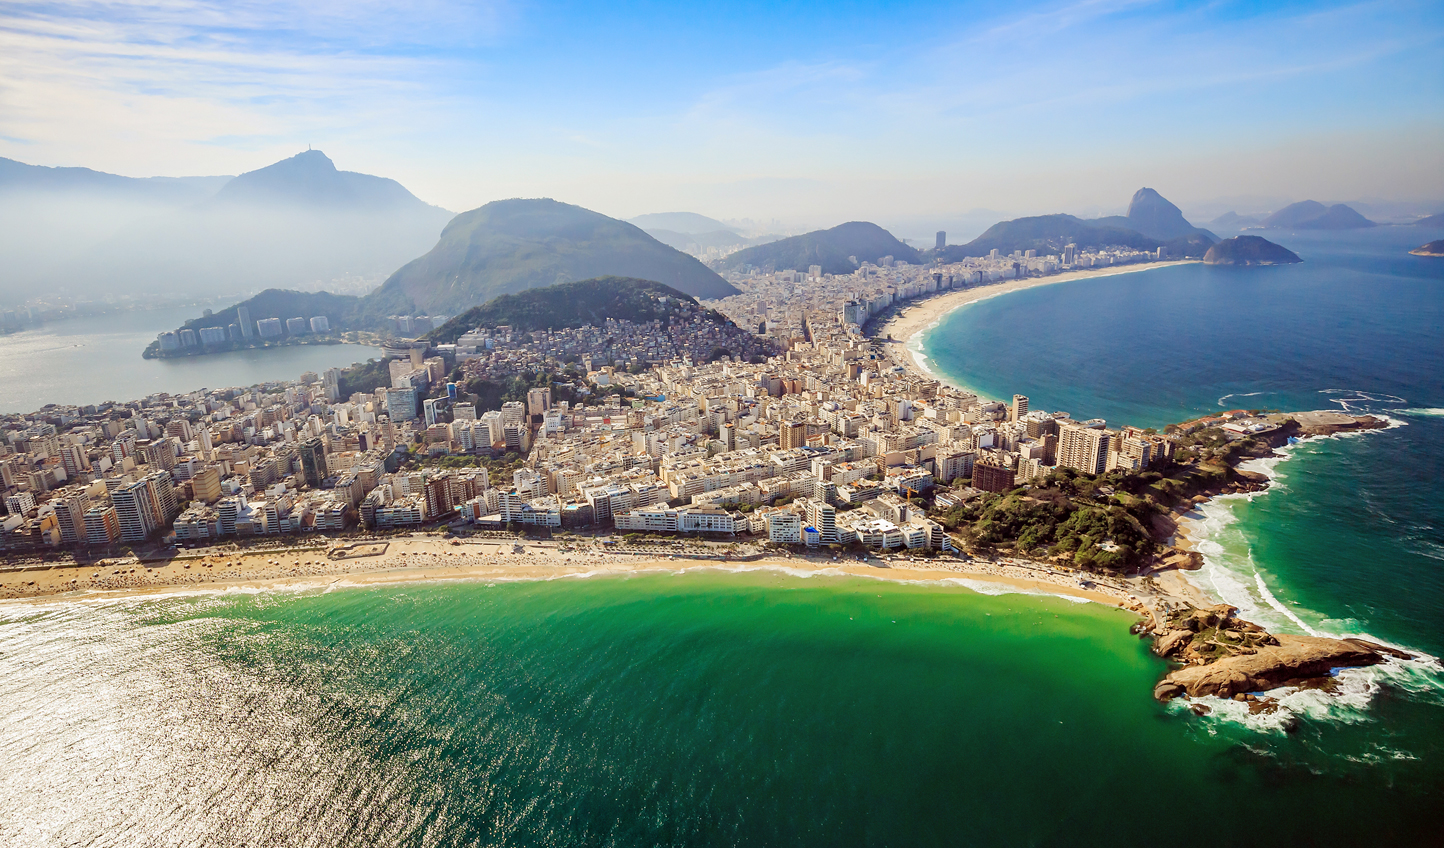 Discover Rio's famous beaches